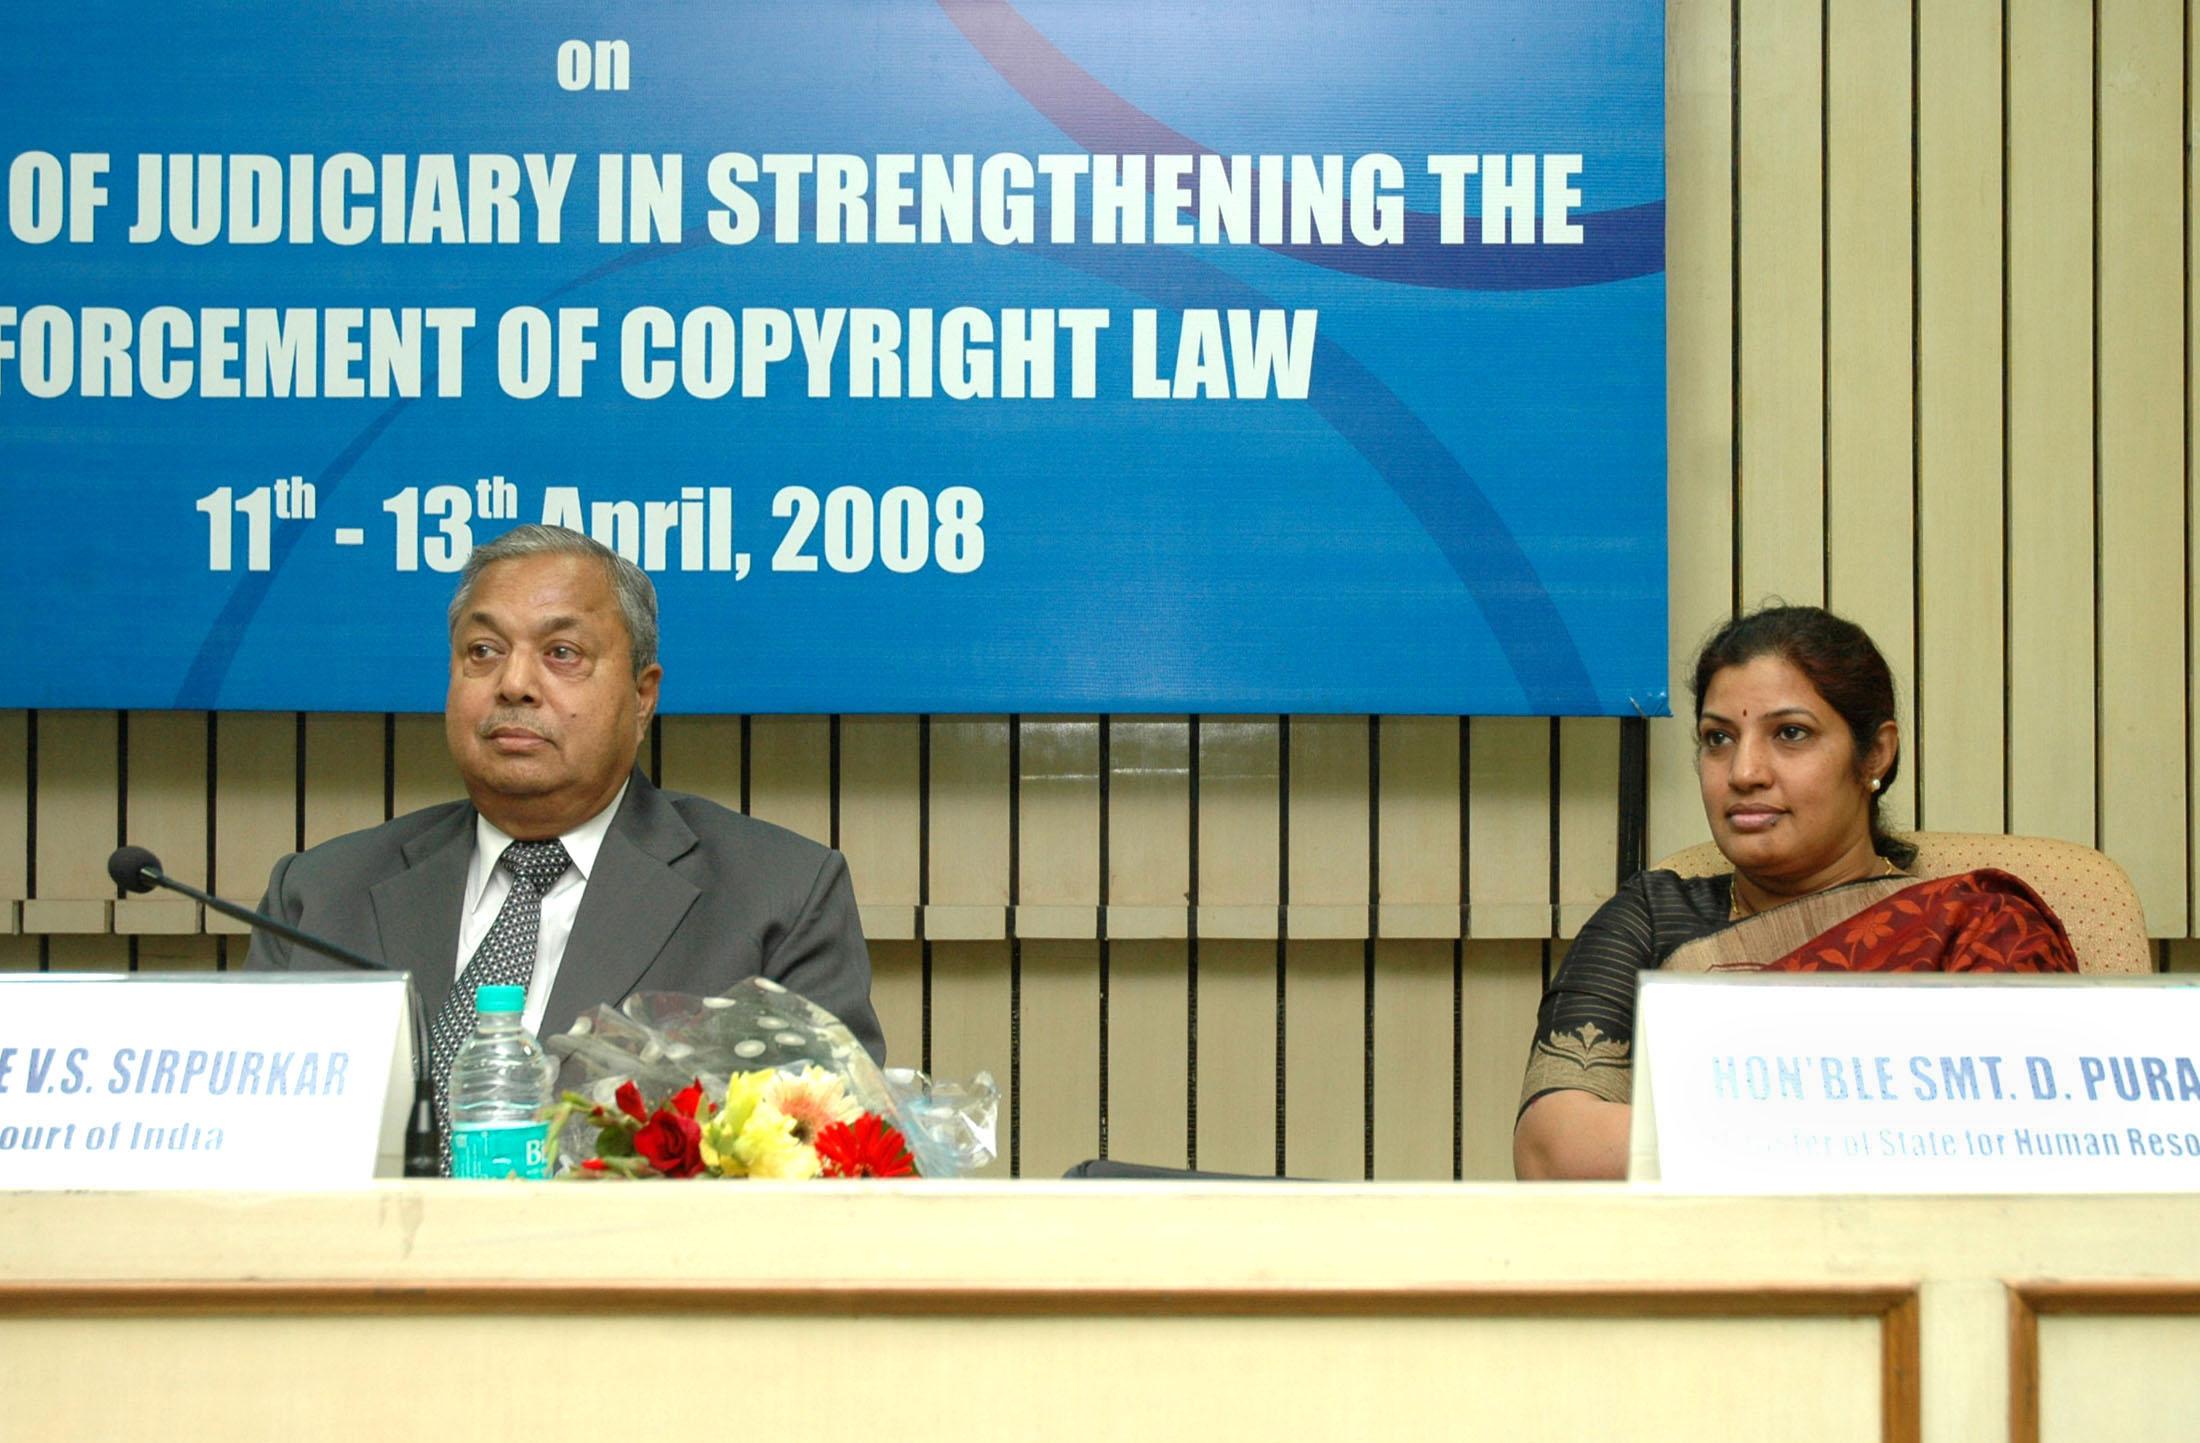 File:D  Purandeswari and the Judge, Supreme Court of India